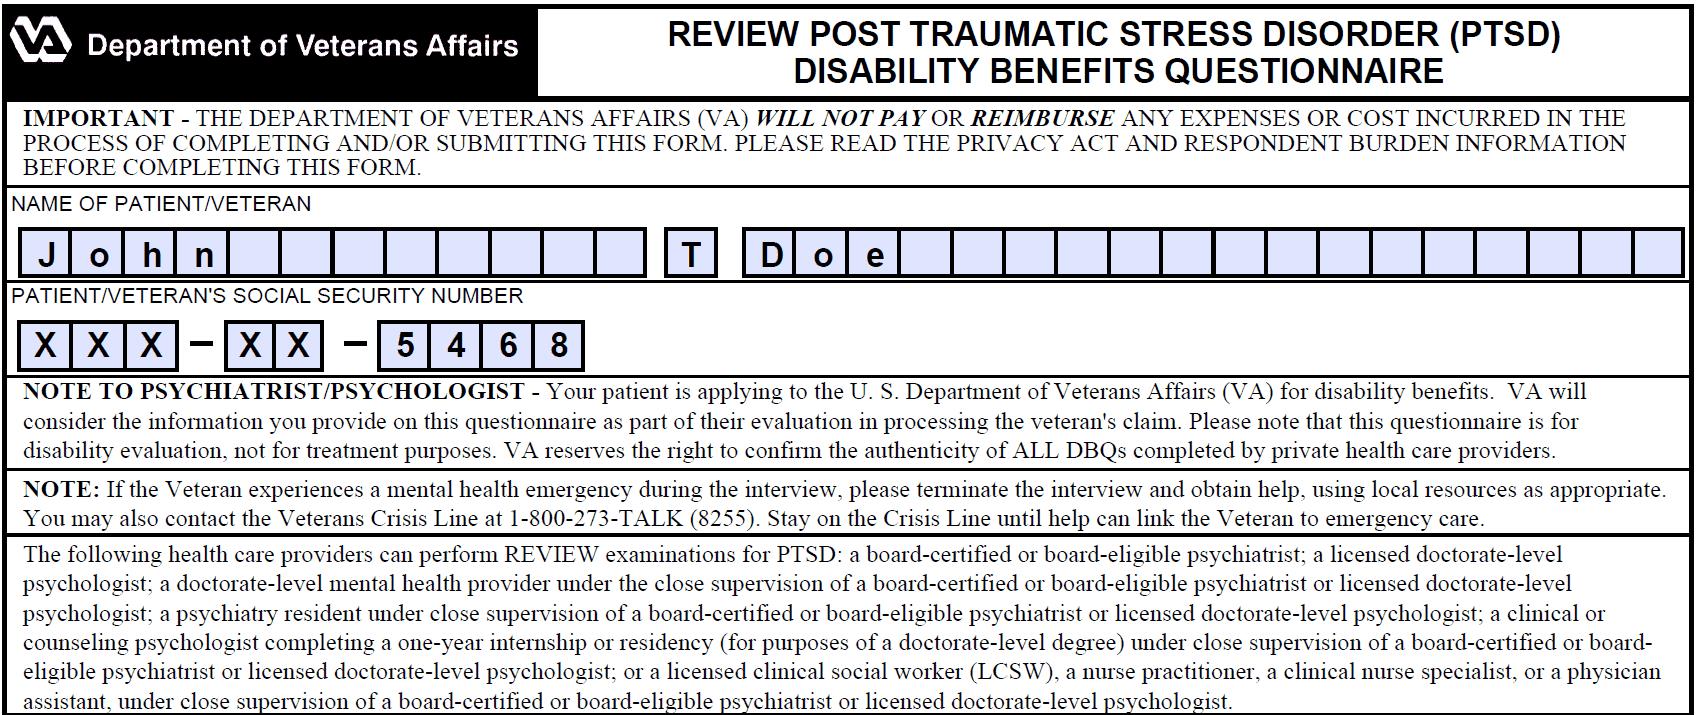 PTSD DBQ Review Form